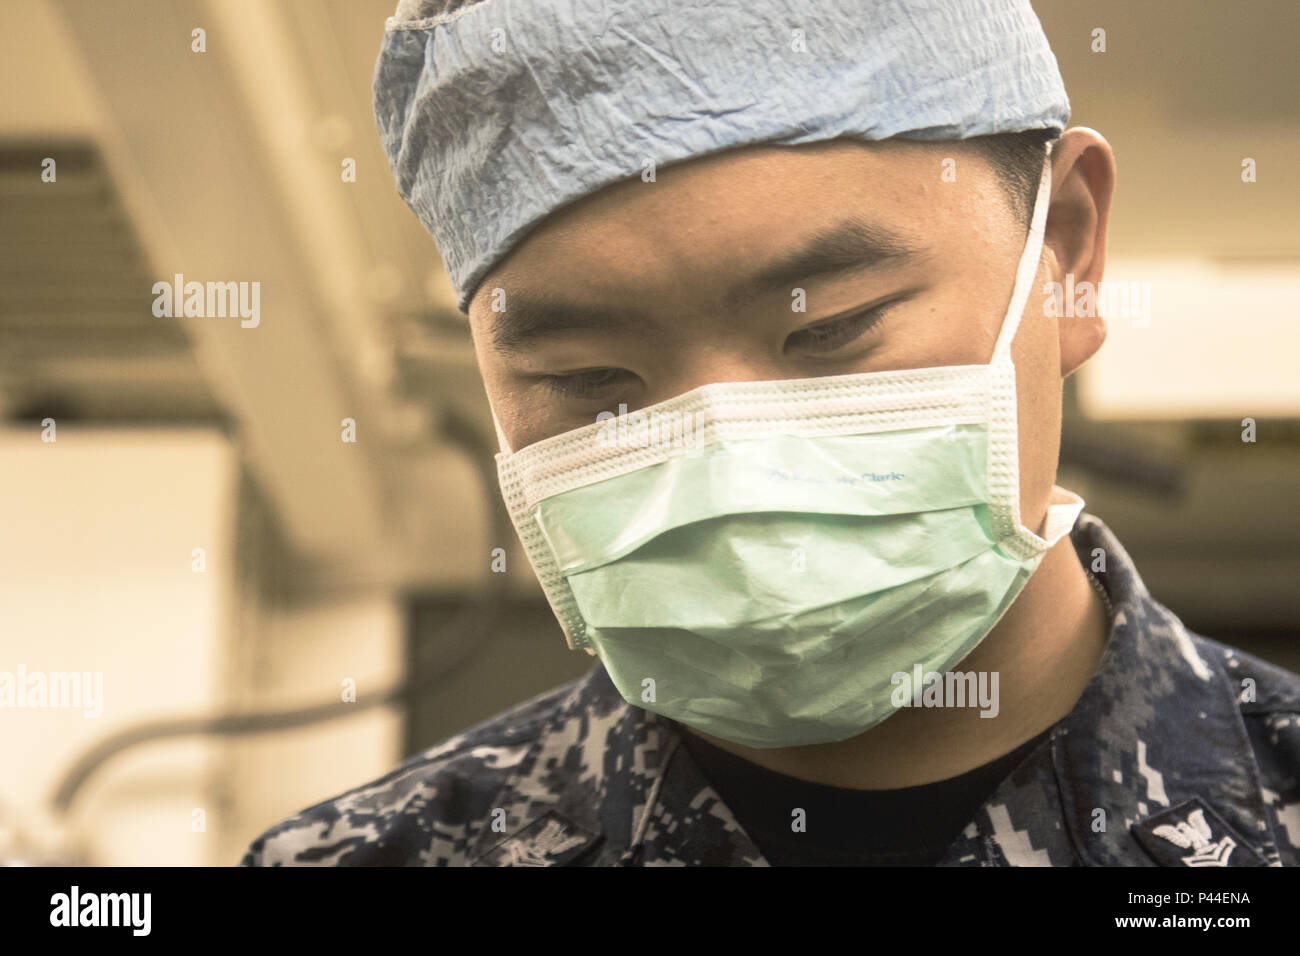 Army Hospital Tent Stockfotos & Army Hospital Tent Bilder - Seite 2 ...